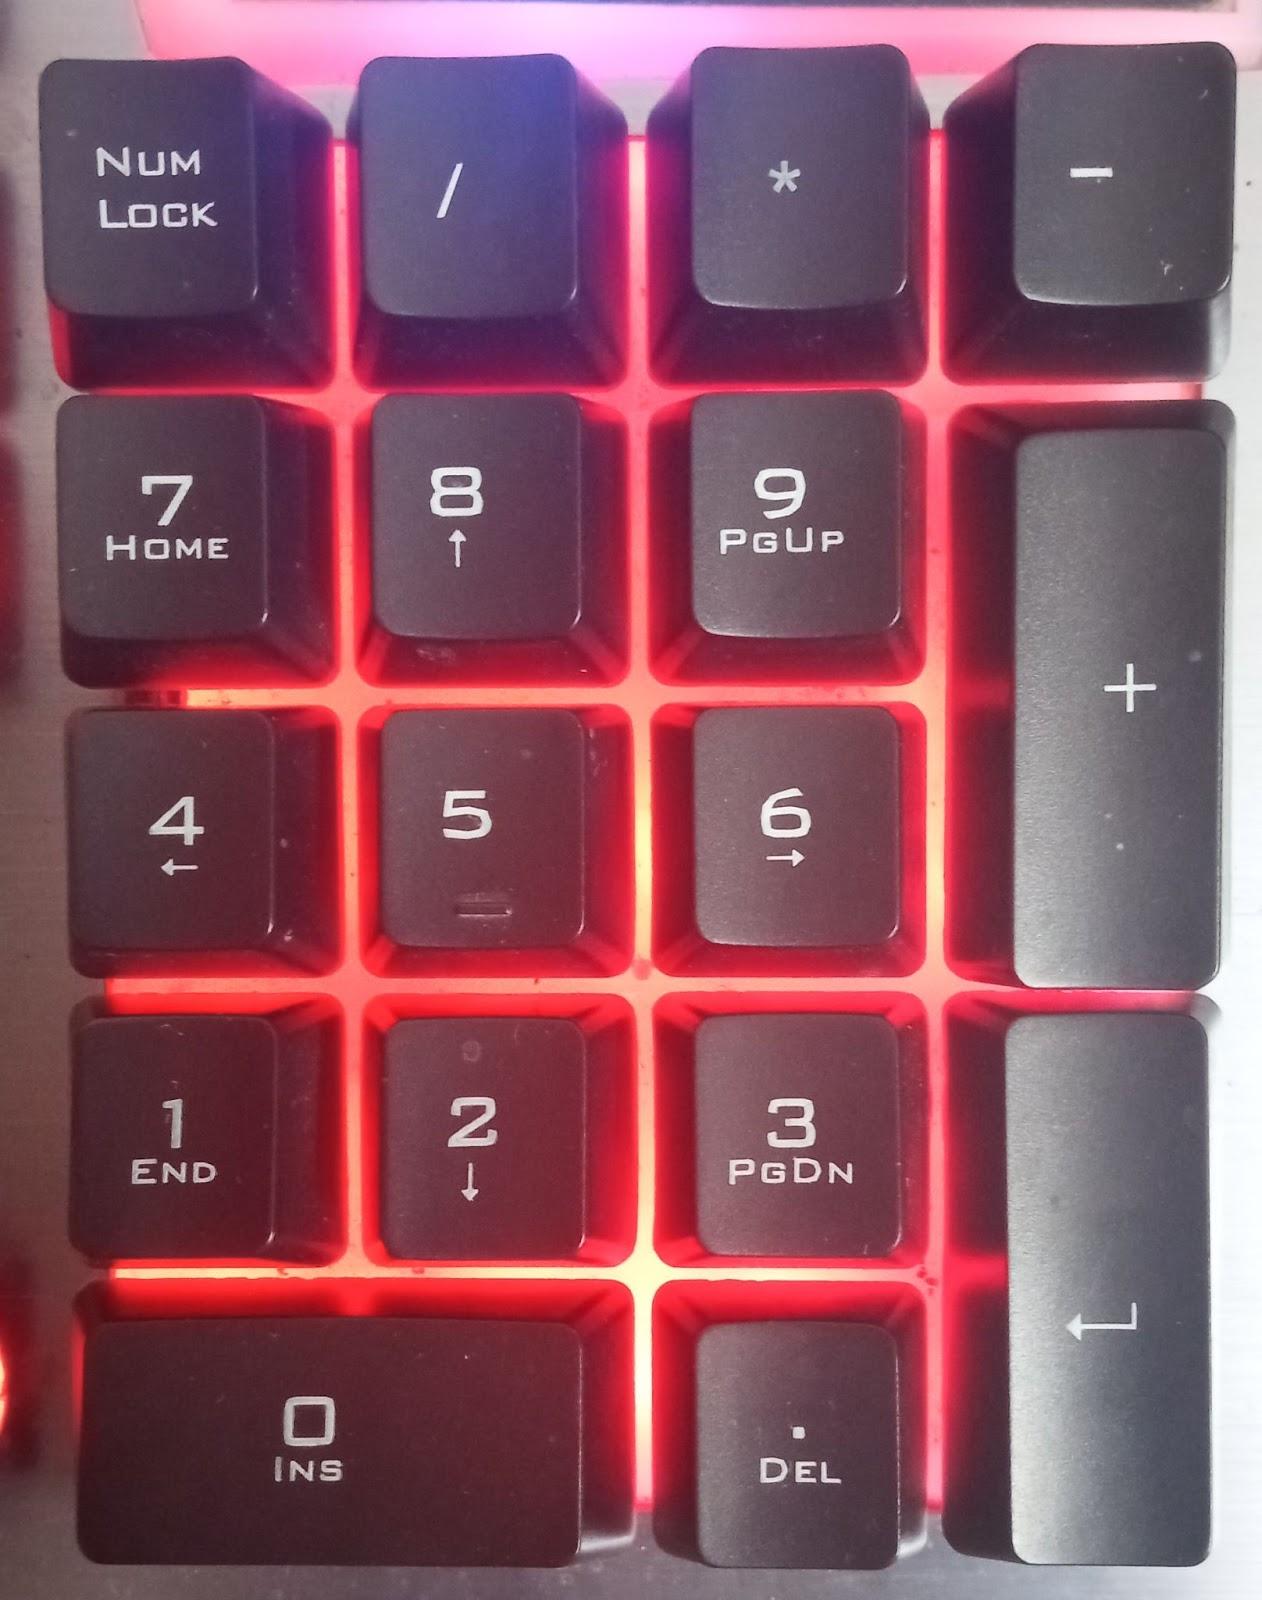 The Number keys on a Numeric Keypad on a keyboard